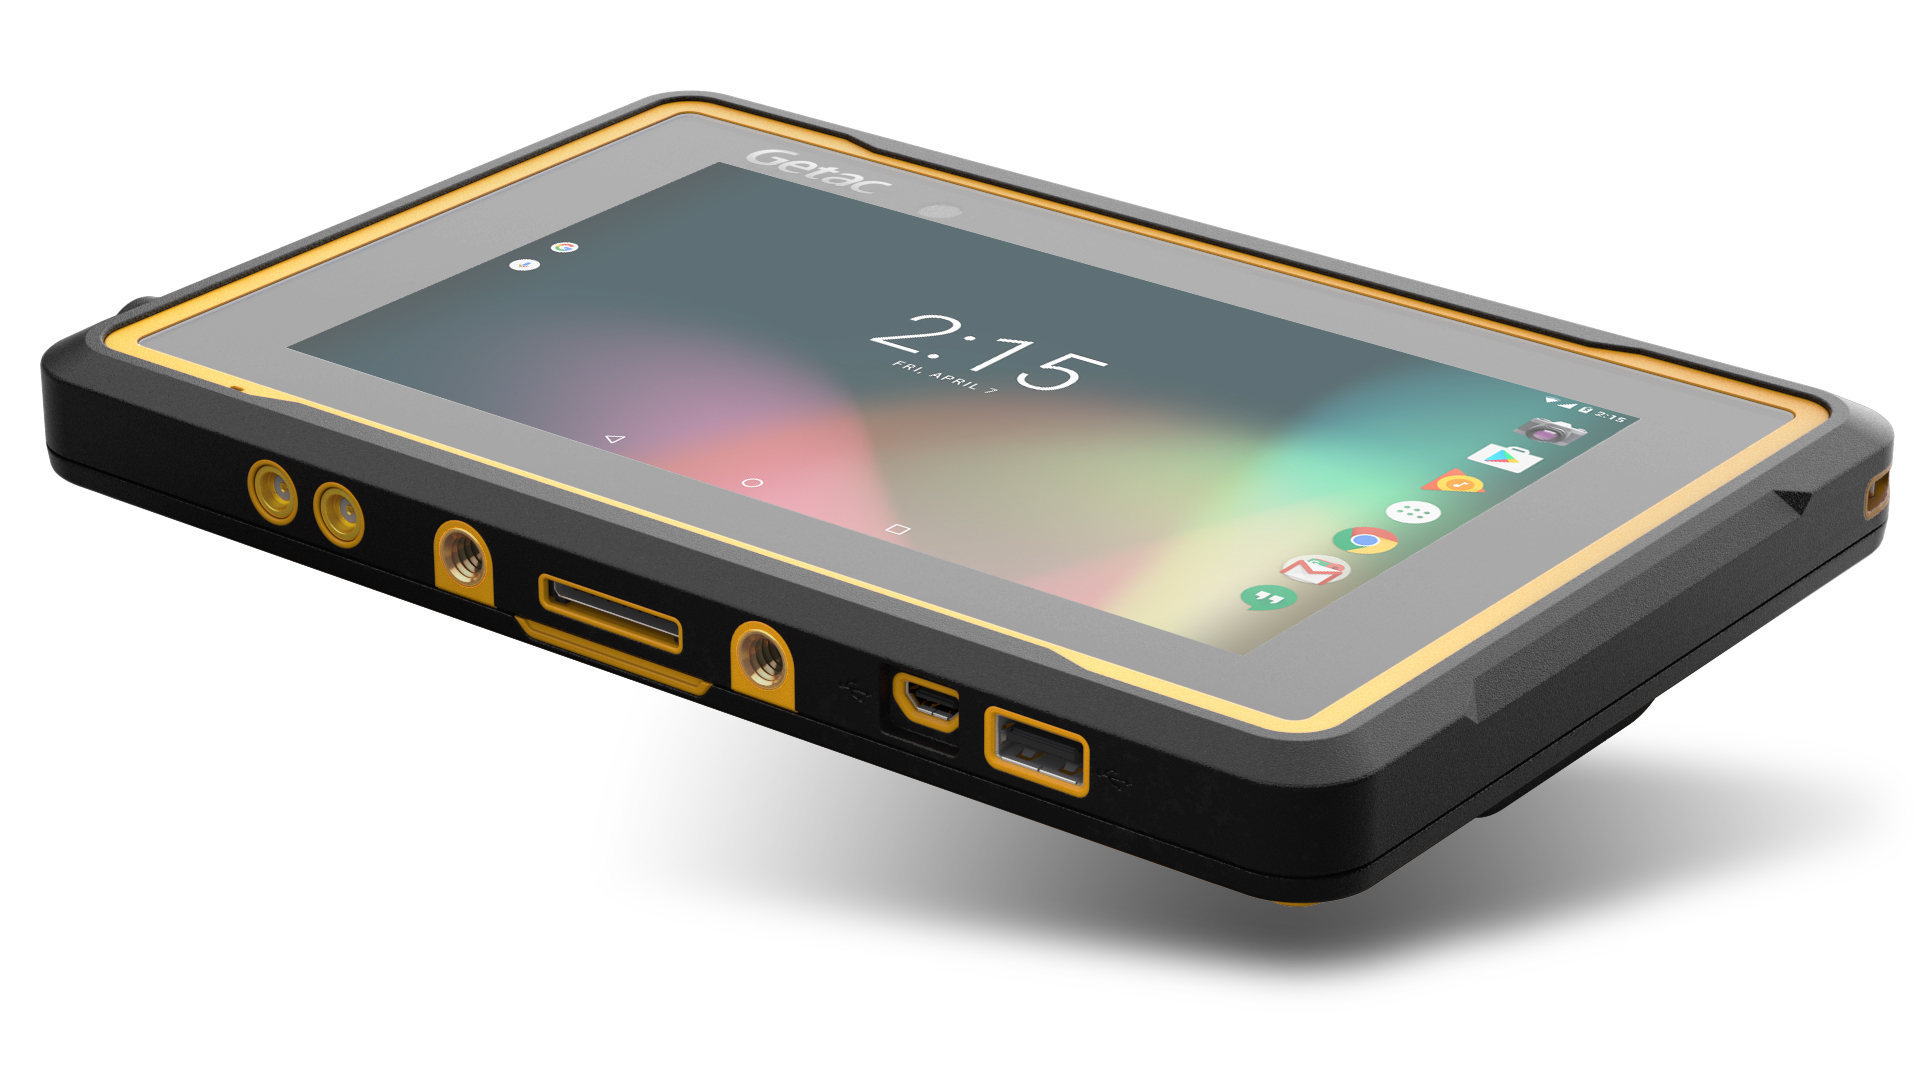 Getac ZX70 - x5-Z8350 - 4G LTE - 8MP Rear Camera